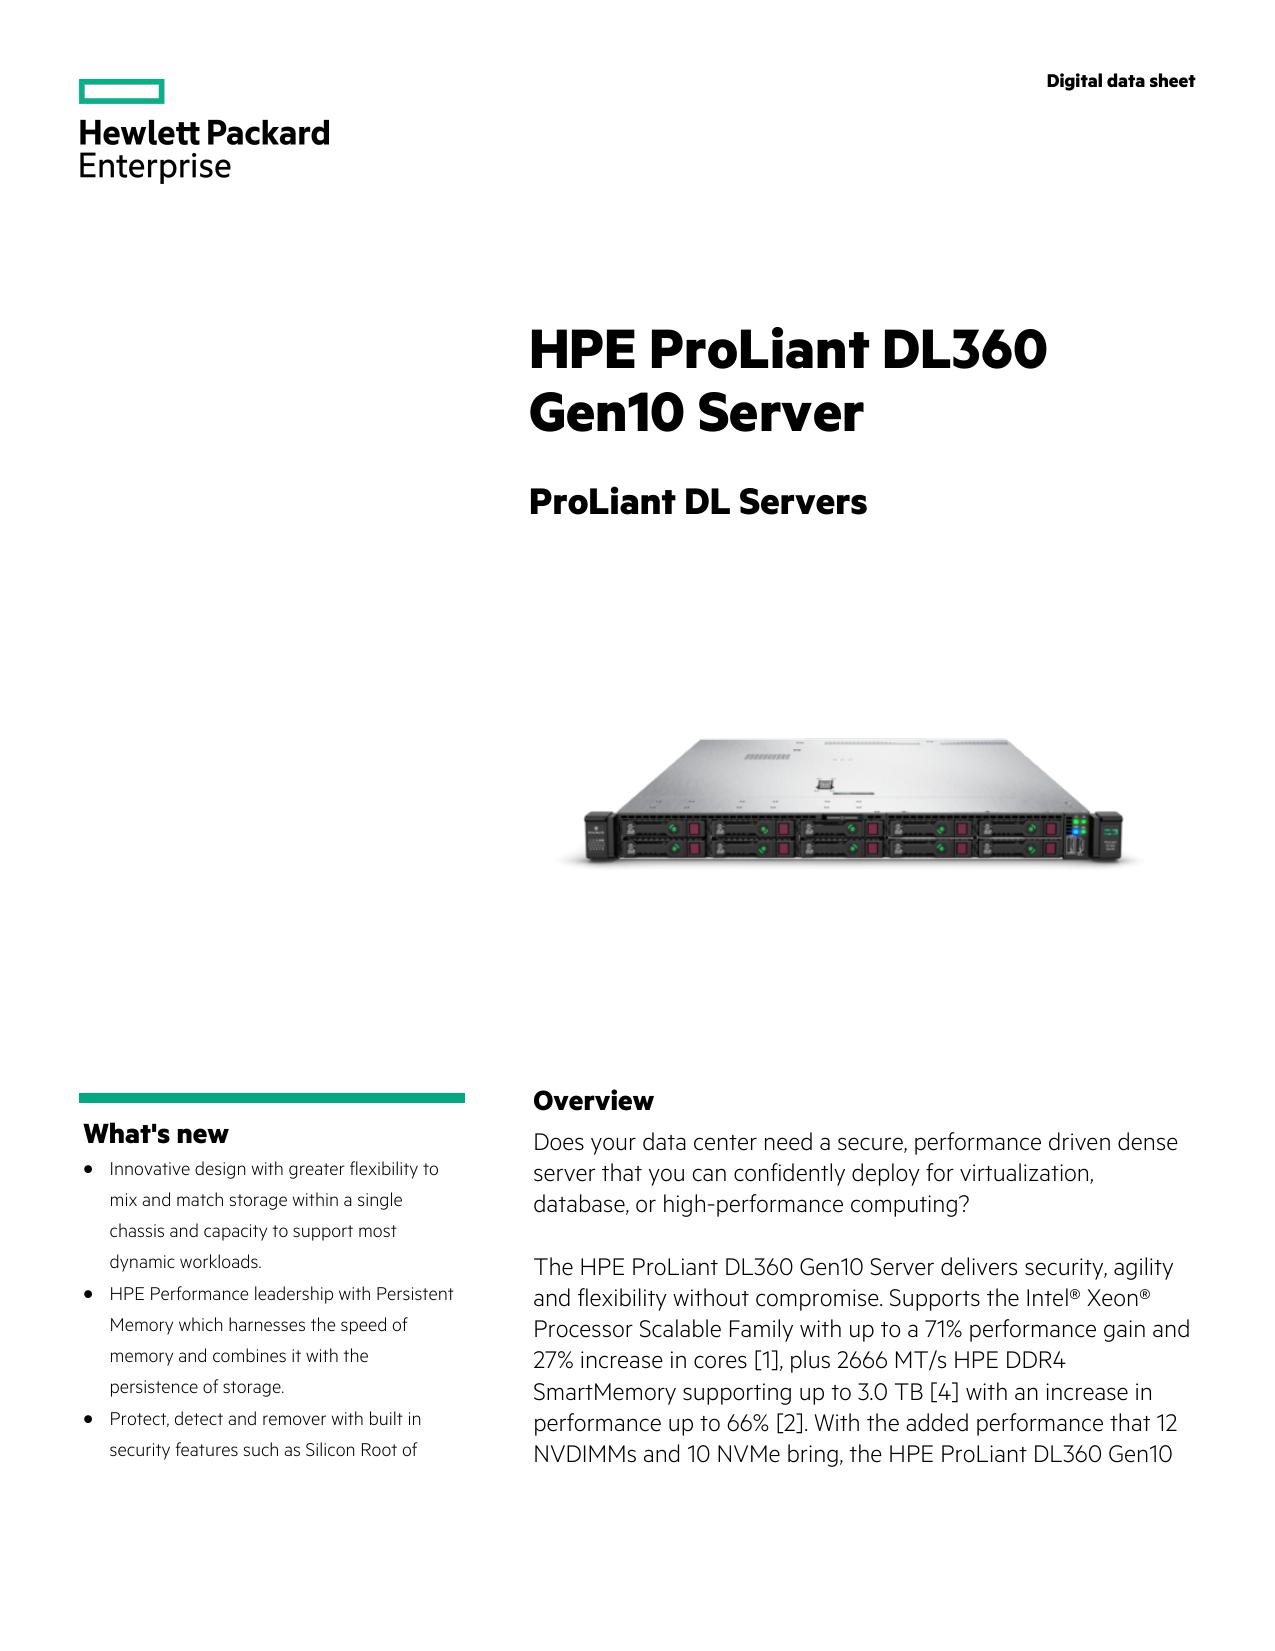 HPE ProLiant DL360 Gen10 Server Digital data sheet | manualzz com